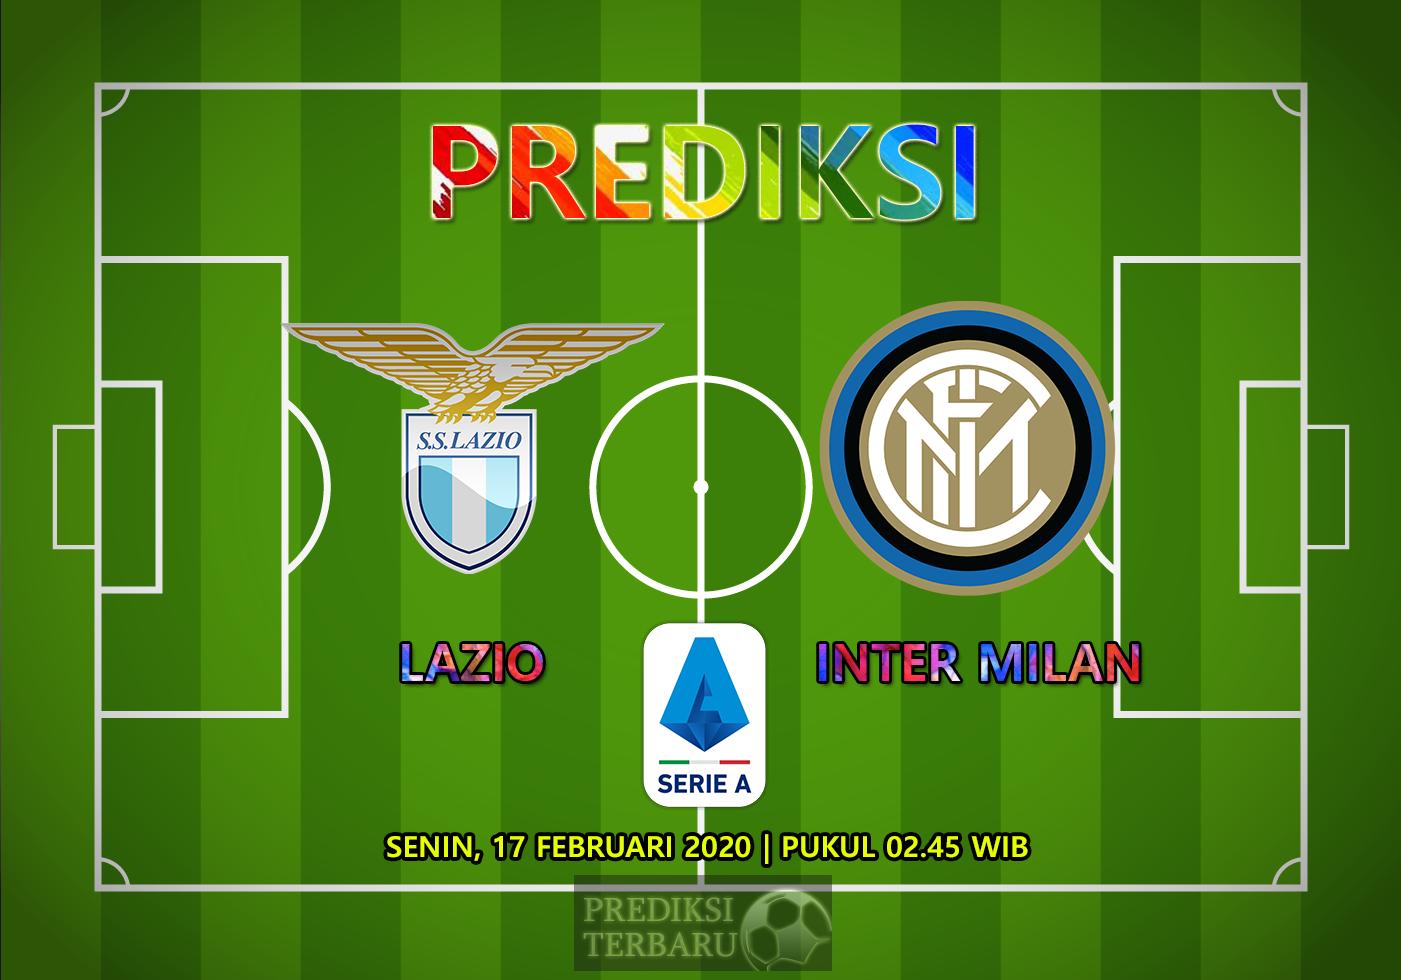 Prediksi Lazio Vs Inter Milan, Senin 17 Februari